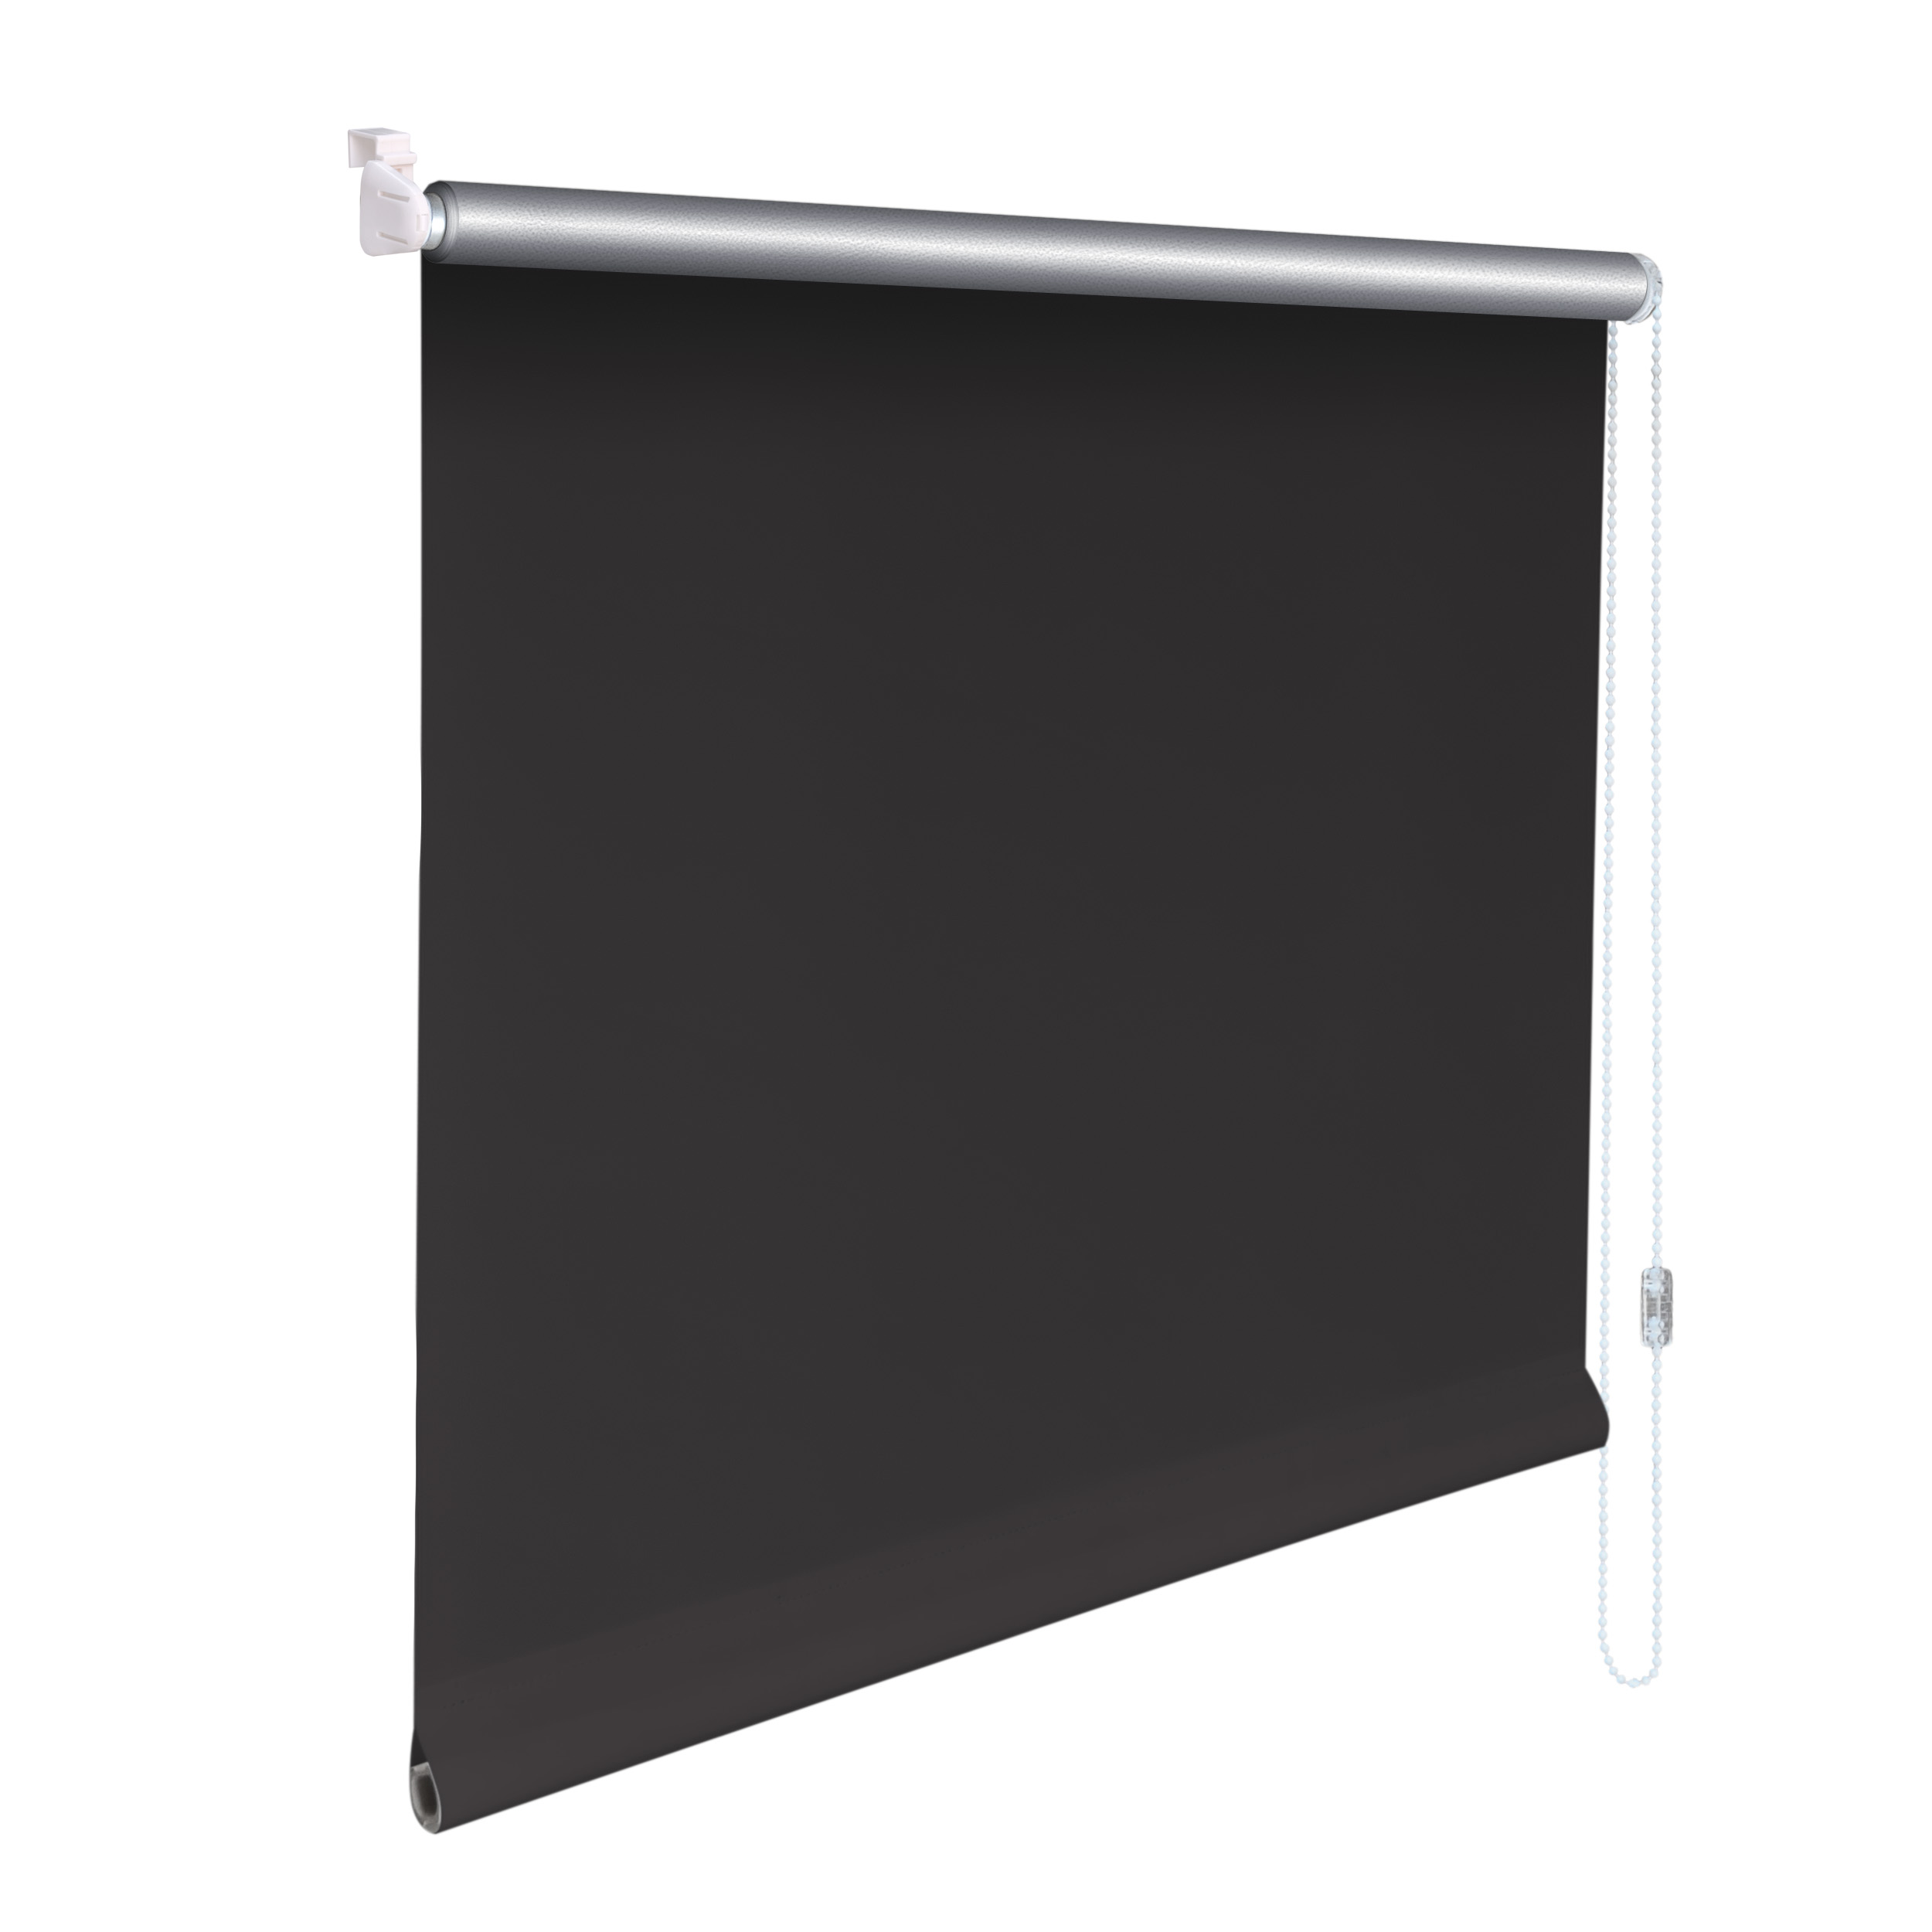 mini rollo klemmfix alu thermo klemmrollo verdunkelung h he 160 cm dunkelgrau ebay. Black Bedroom Furniture Sets. Home Design Ideas